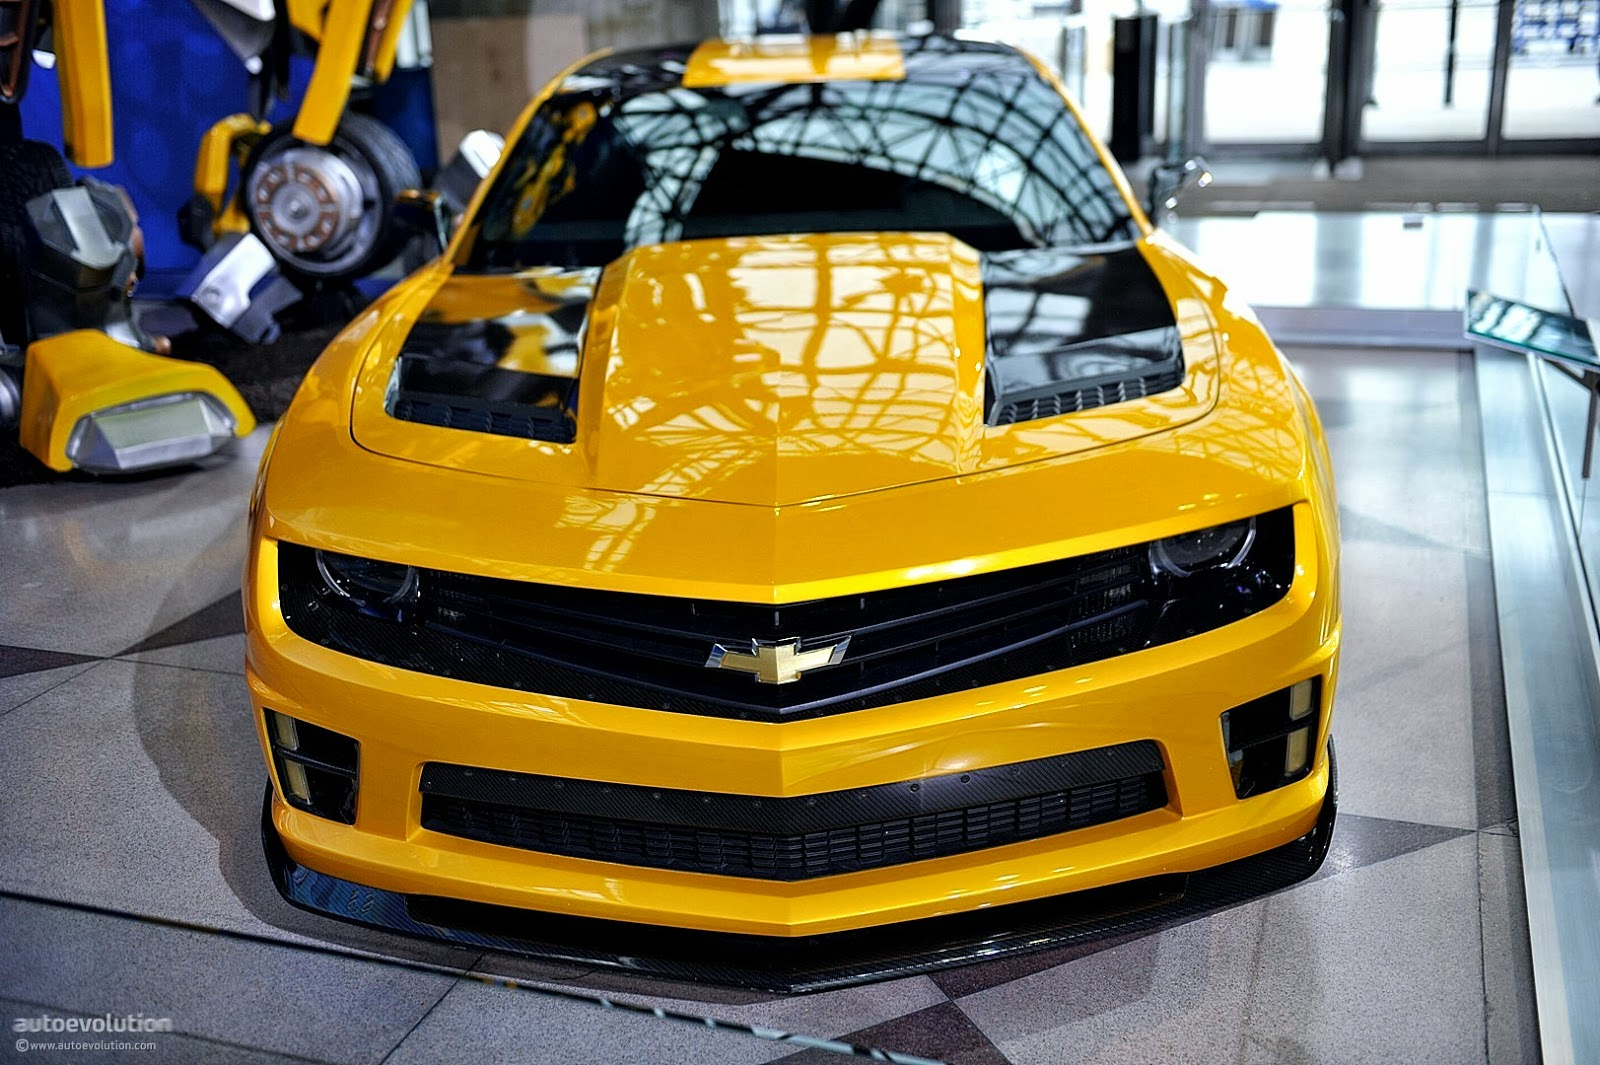 camaro bumblebee car images hd